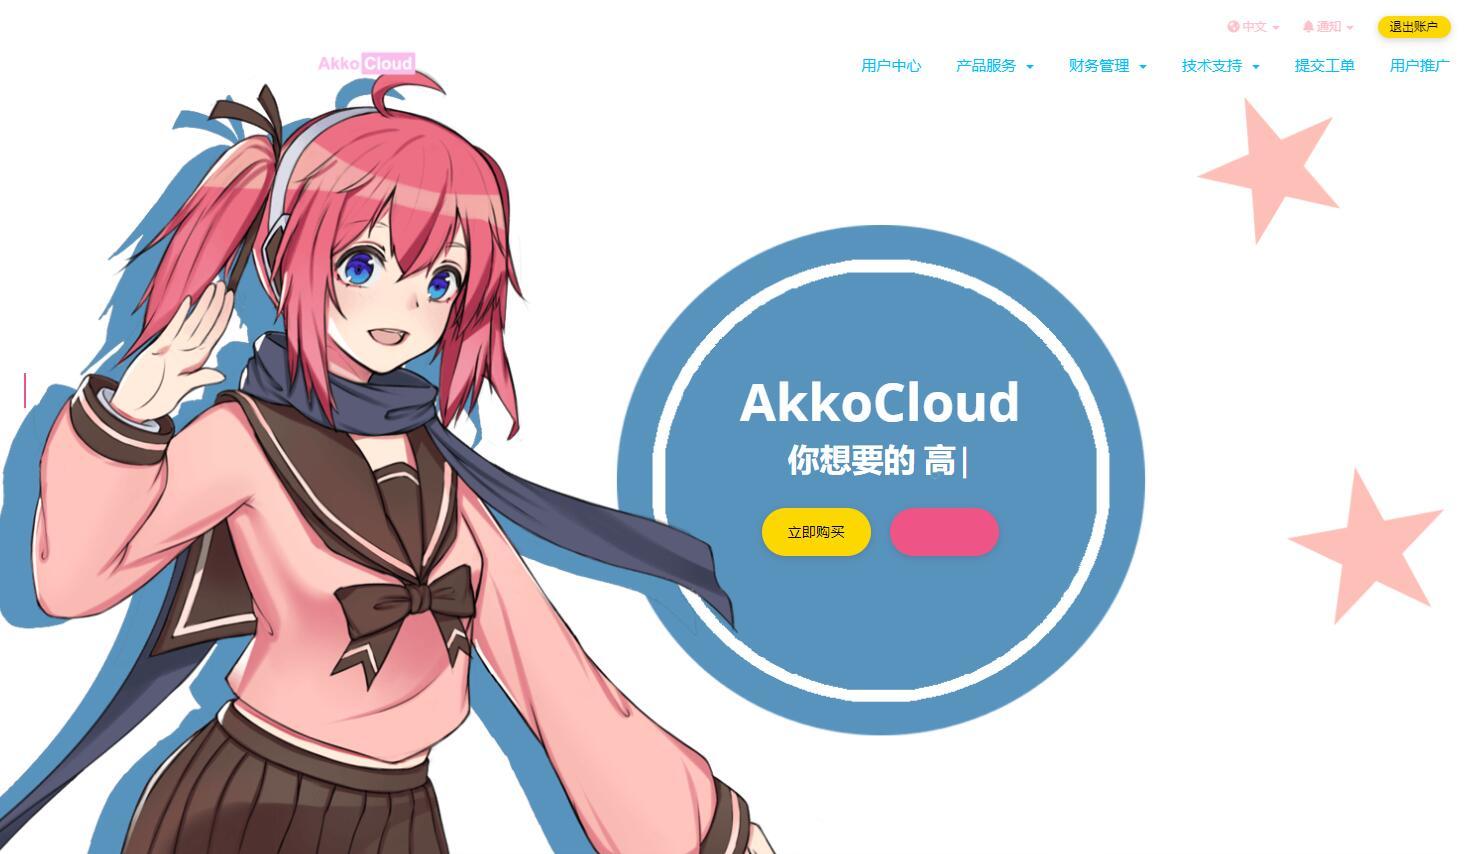 AkkoCloud德国VPS推荐 - CN2 GIA原生IP速度超快